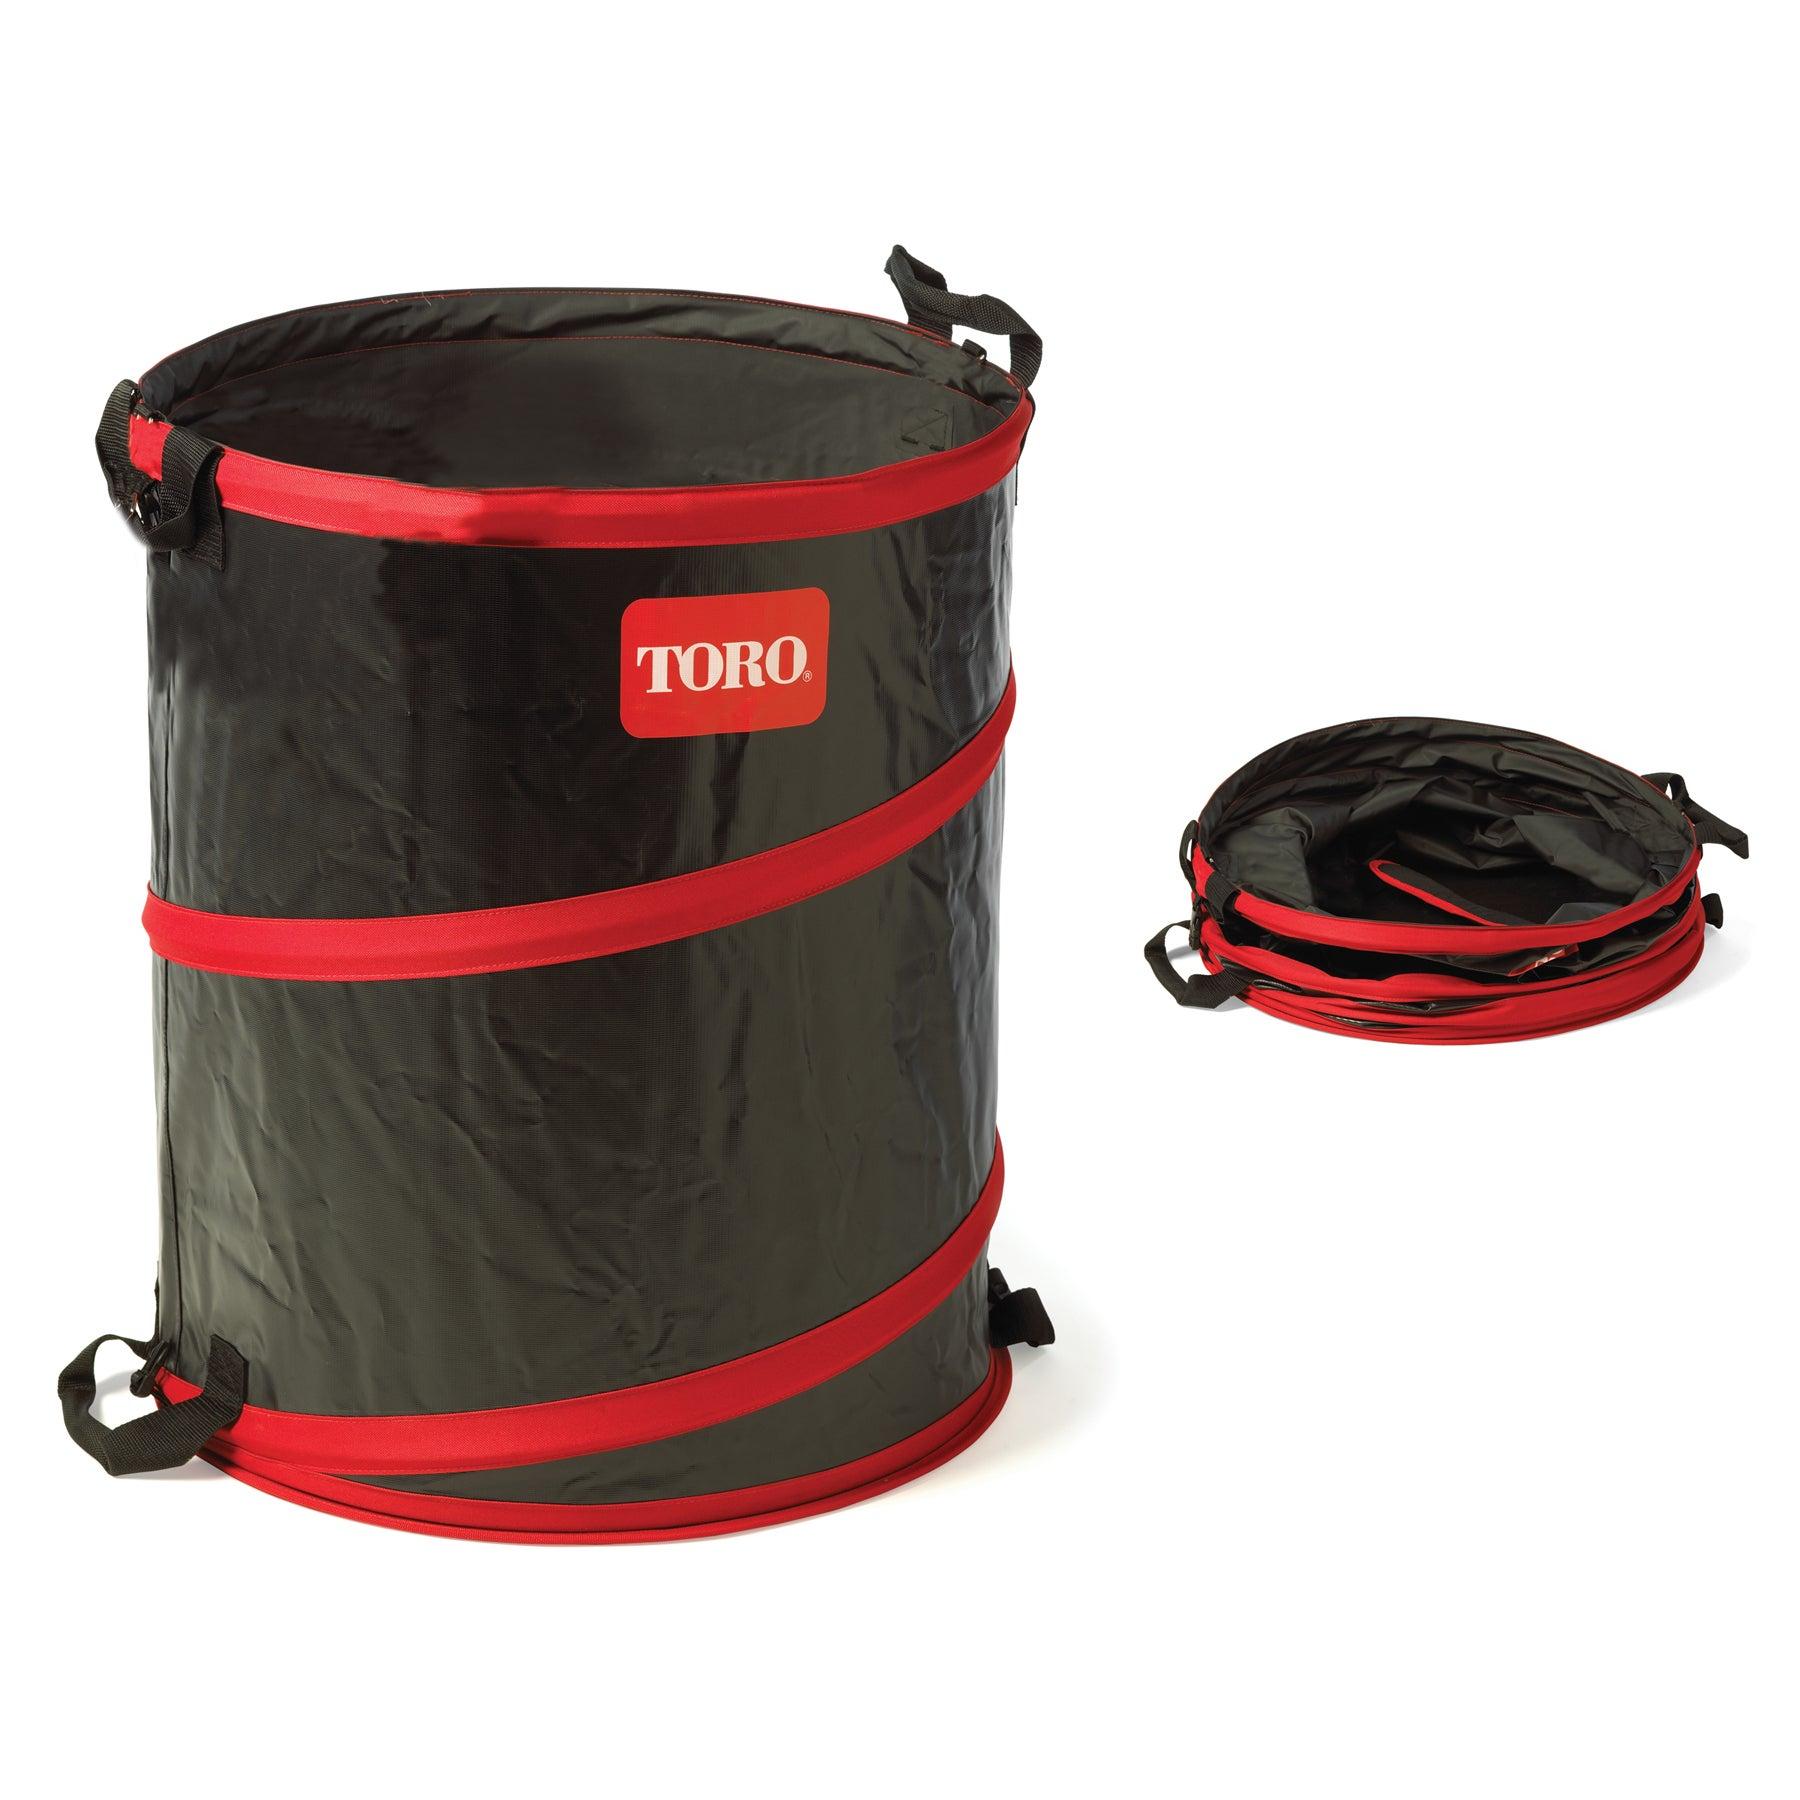 Toro 29210 43 Gallon Gardening Spring Bucket (Spring Buck...